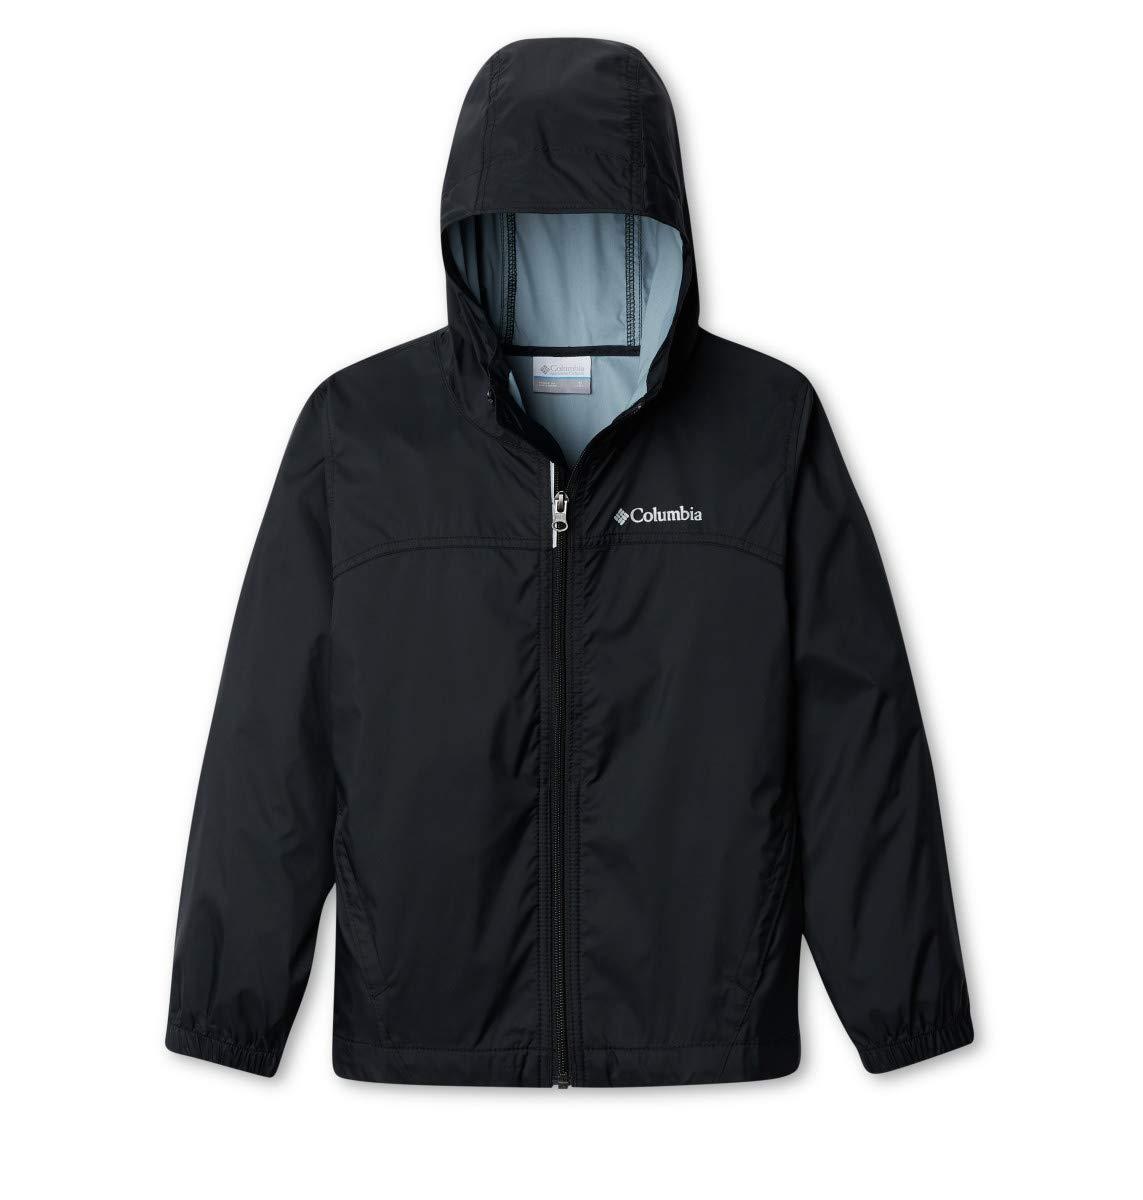 Columbia Big Boys' Glennaker Rain Jacket, Black, Medium by Columbia